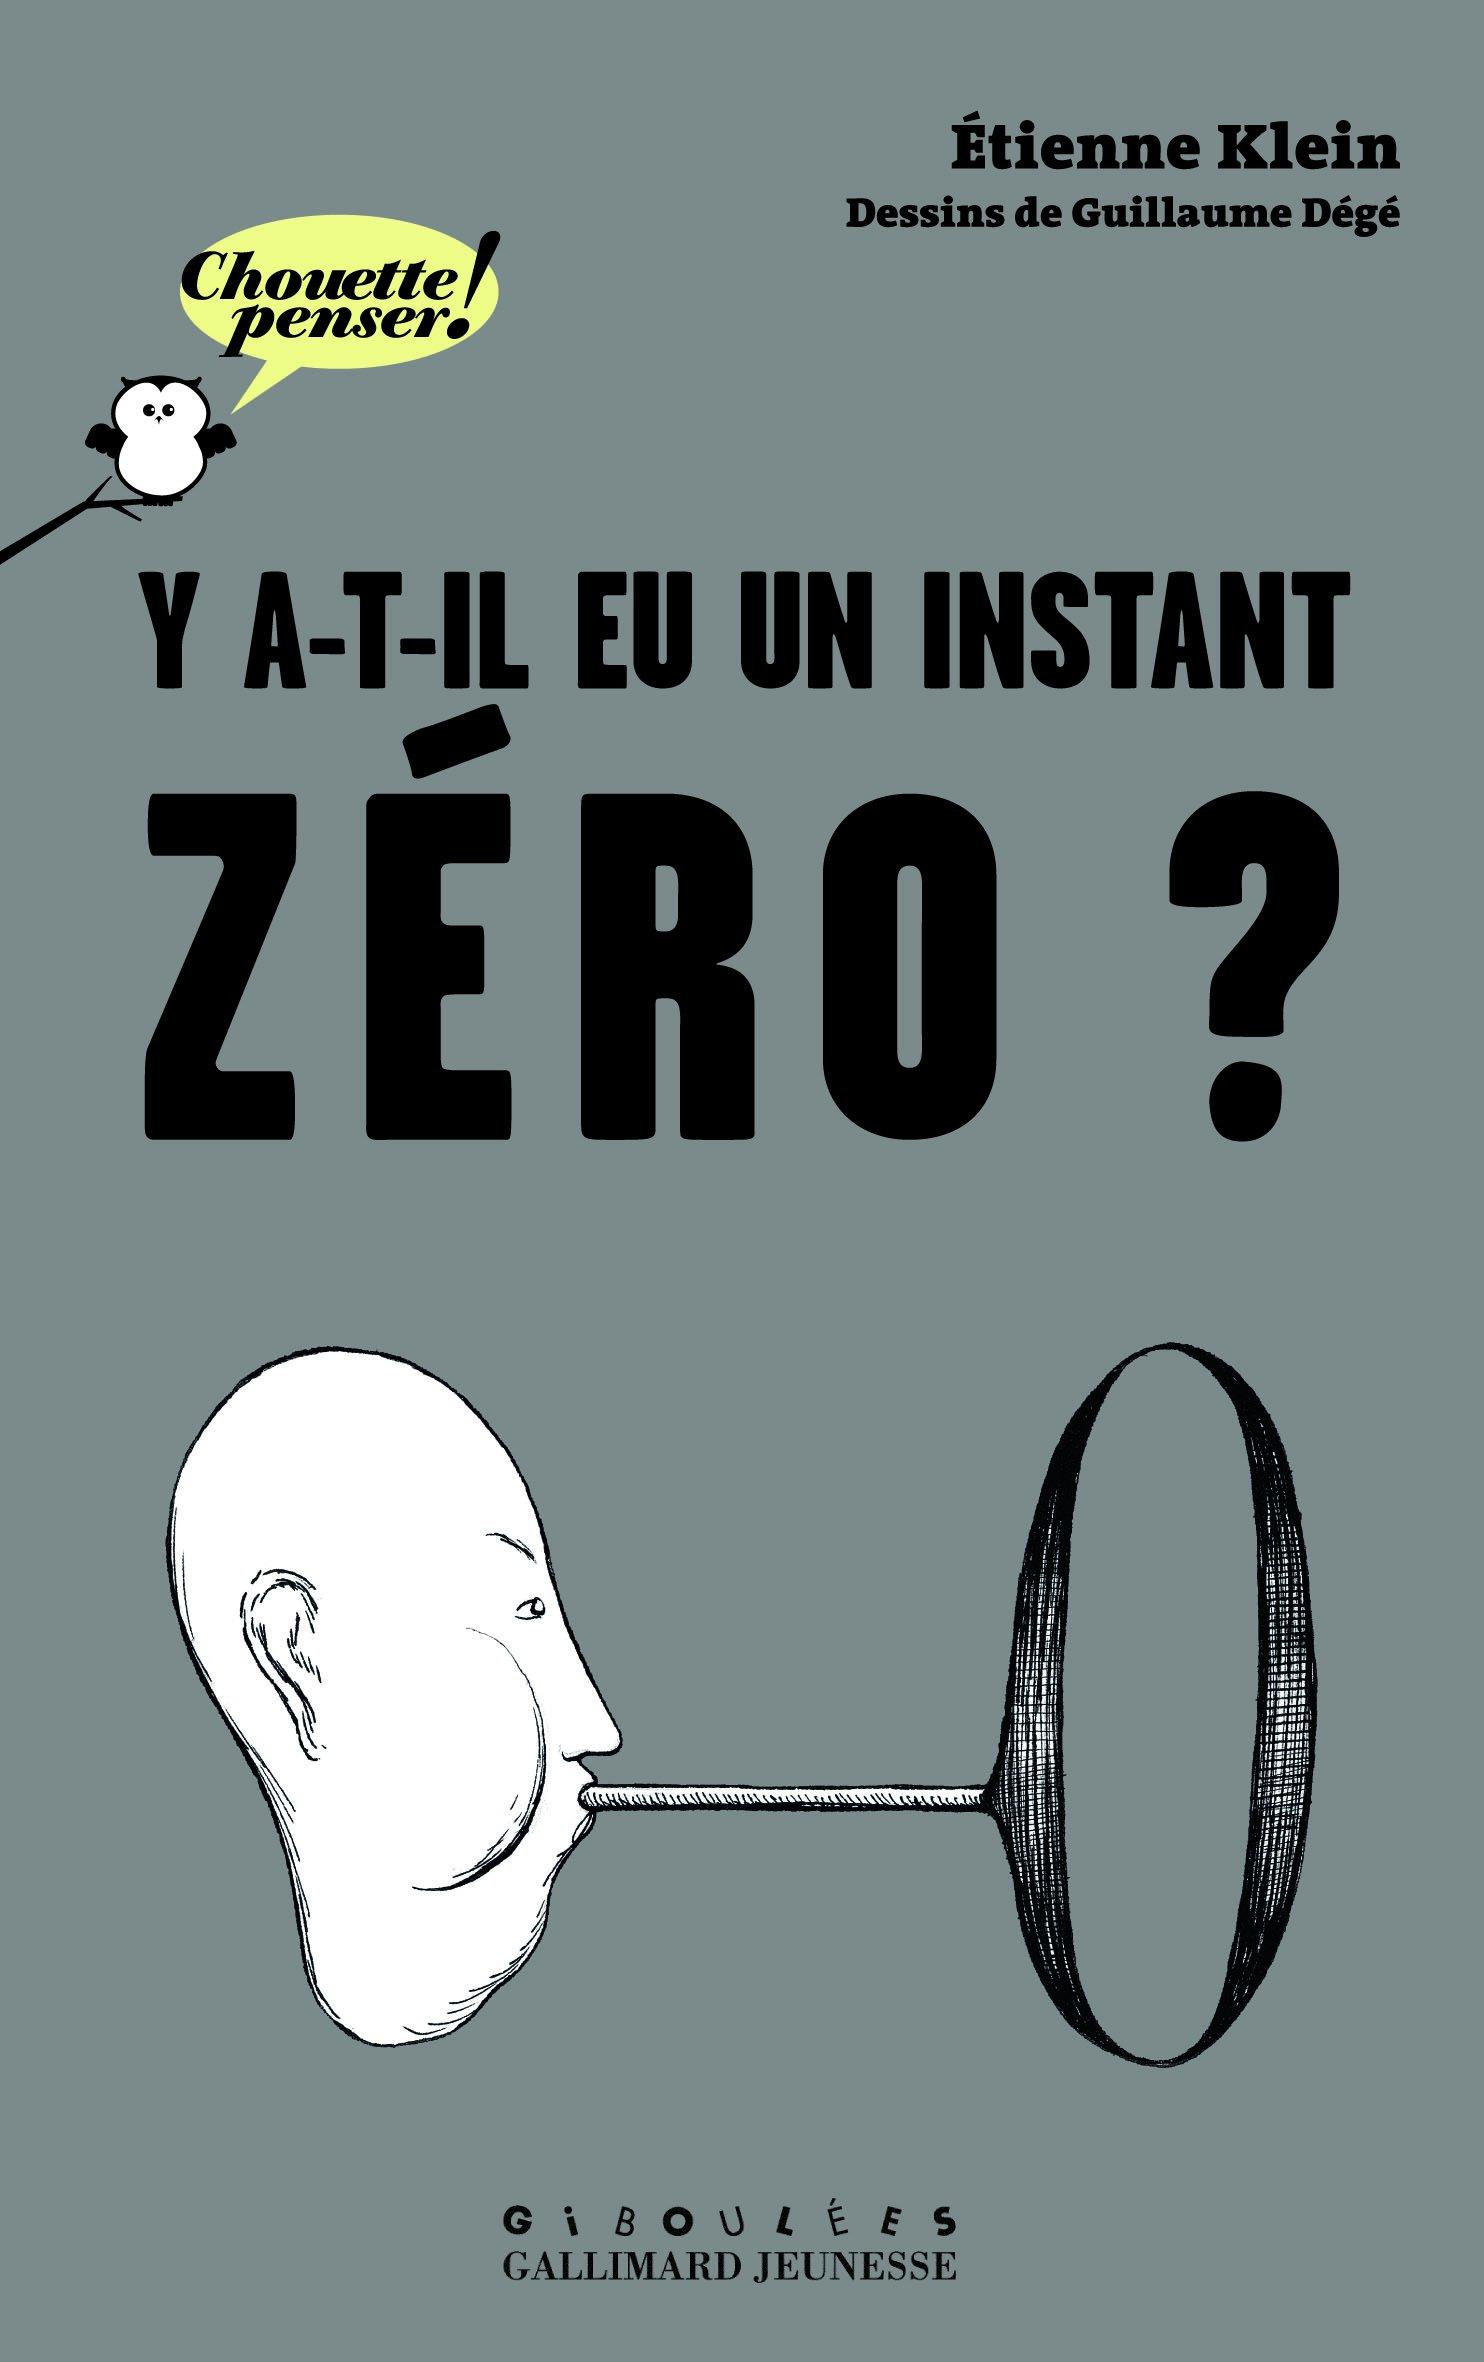 Amazon.in: Buy Y a-t-il eu un instant zéro ? Book Online at Low Prices in  India | Y a-t-il eu un instant zéro ? Reviews & Ratings